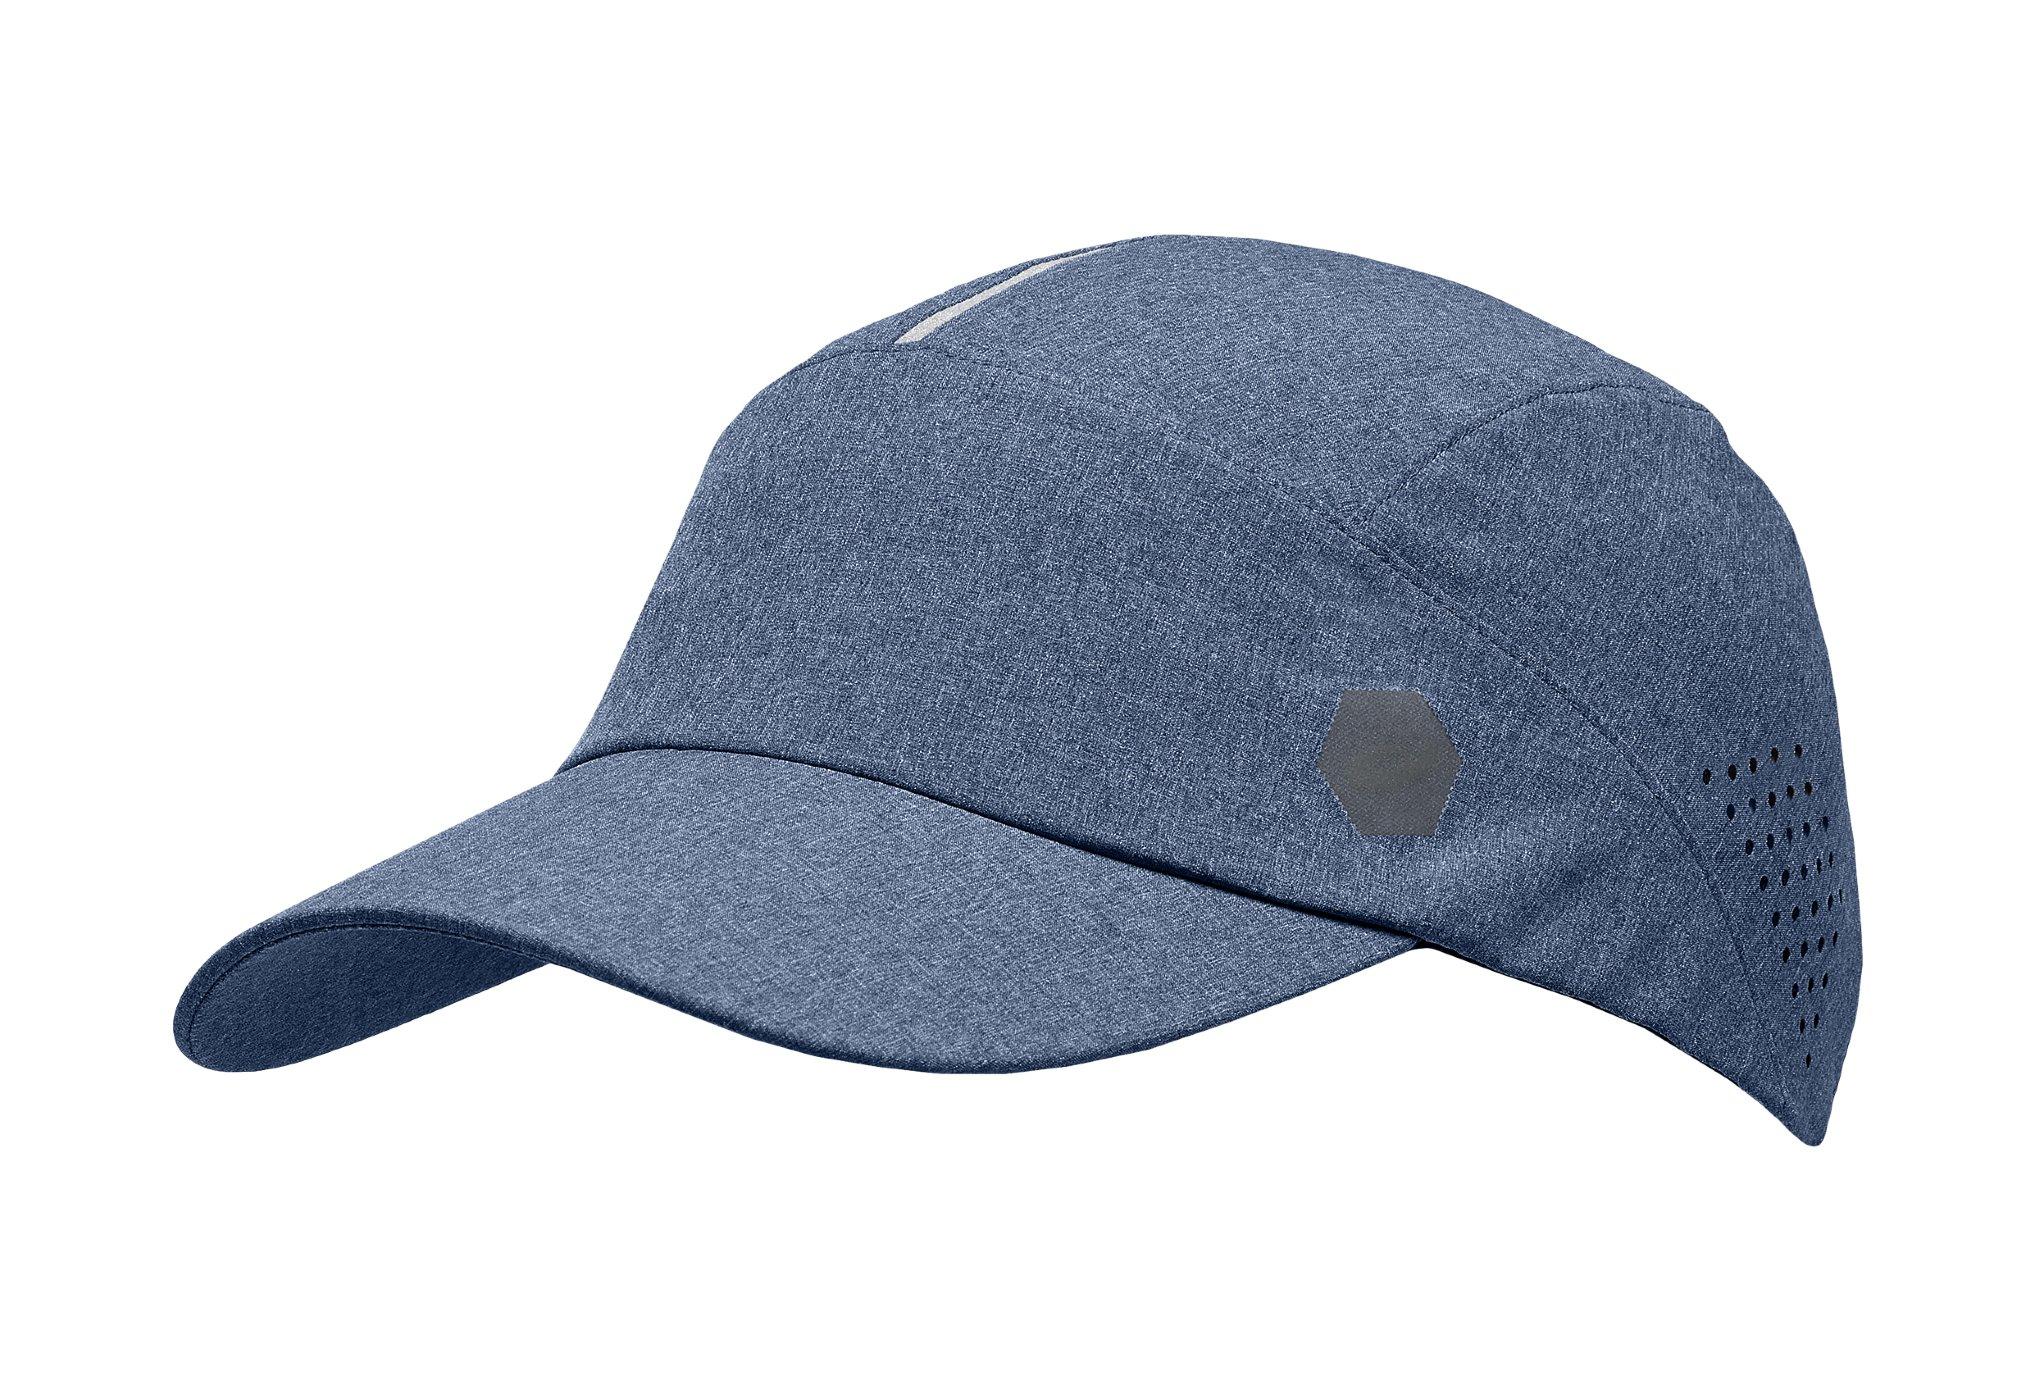 Asics Running cap casquettes / bandeaux